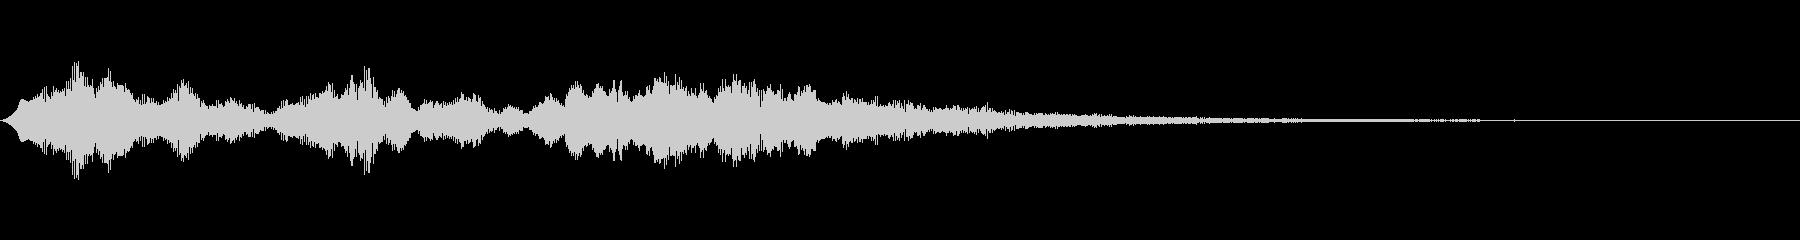 【SE 効果音】不気味な音14の未再生の波形